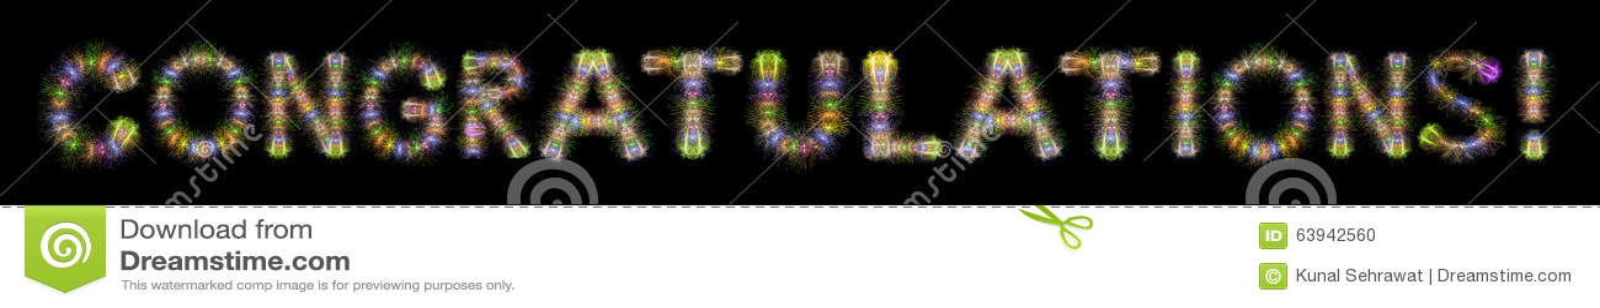 Buntes funkelndes Feuerwerke des Glückwunschtextes horizontales bla